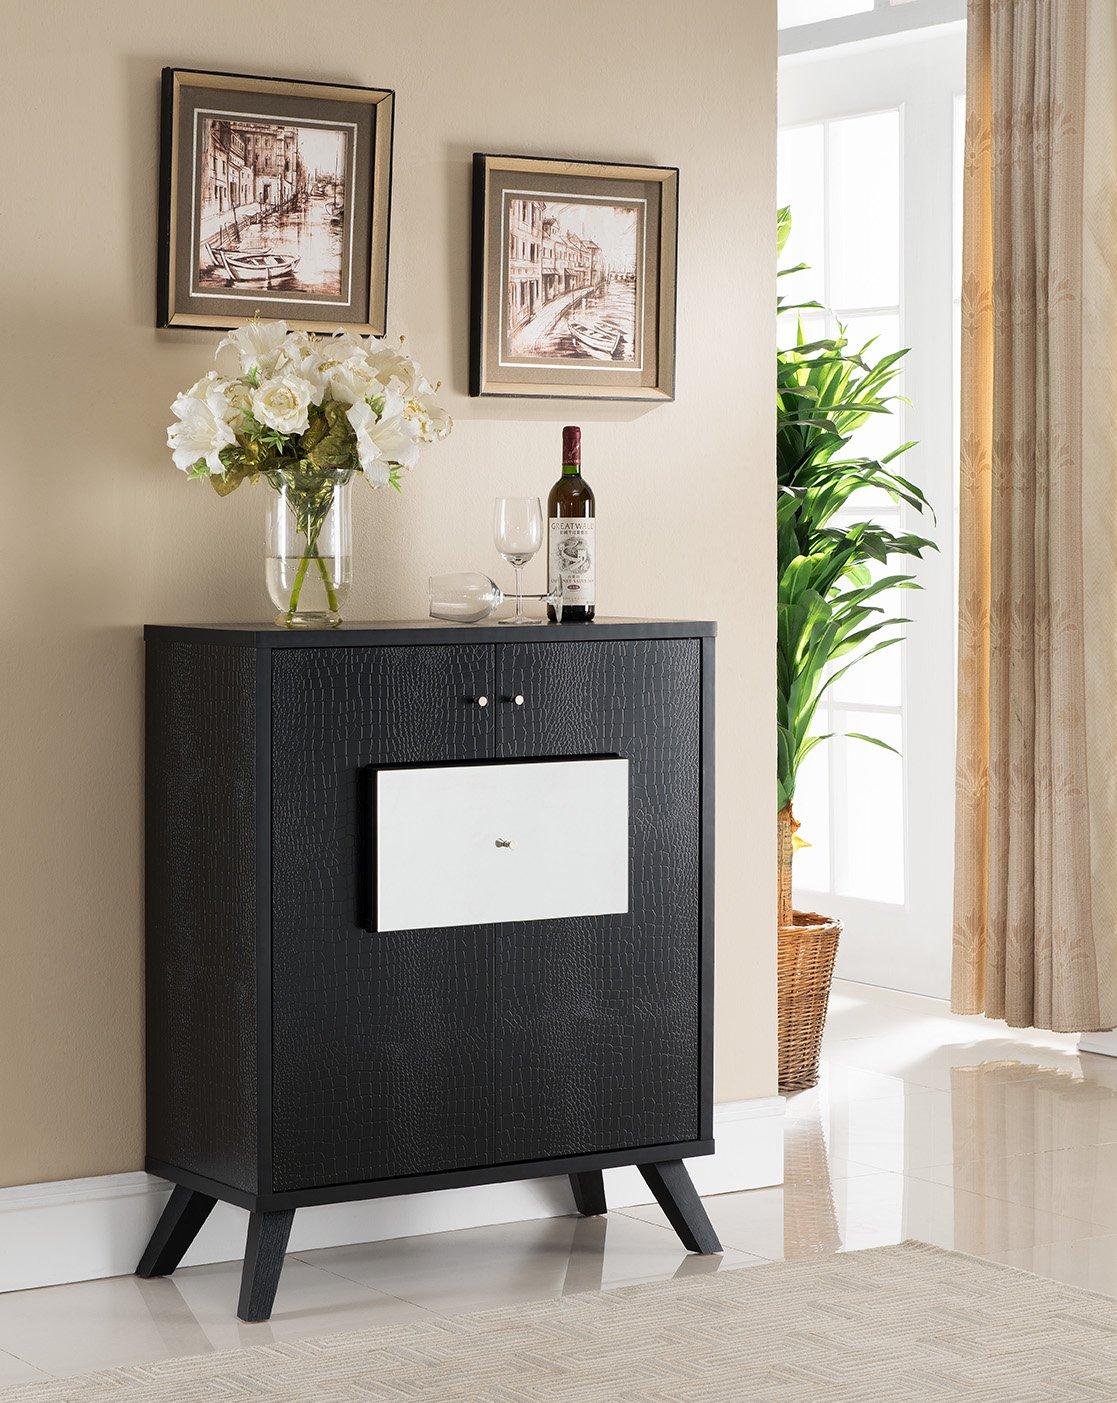 Buy Modern Fine Dining Wine Dark Espresso Storage Buffet Intended For Modern Espresso Storage Buffets (View 3 of 30)